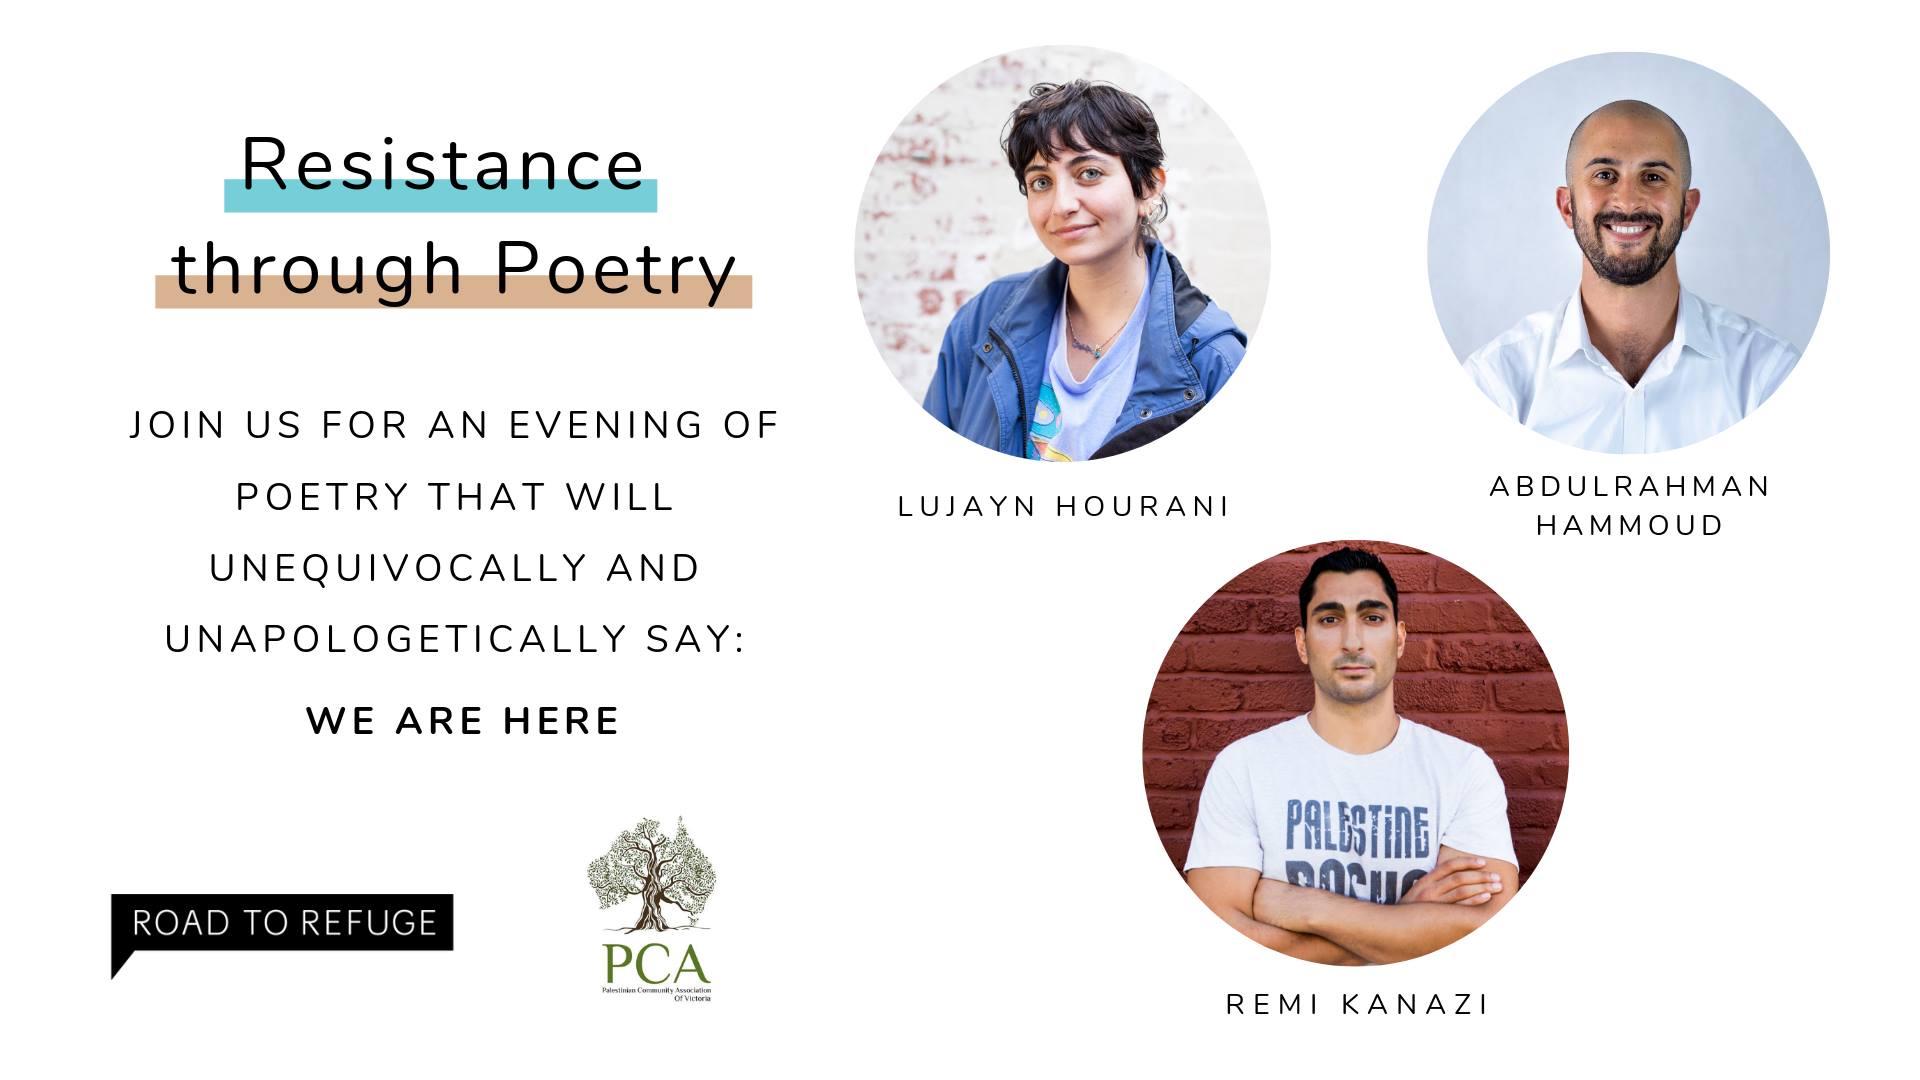 r2r PCA Resistance through Poetry.jpg